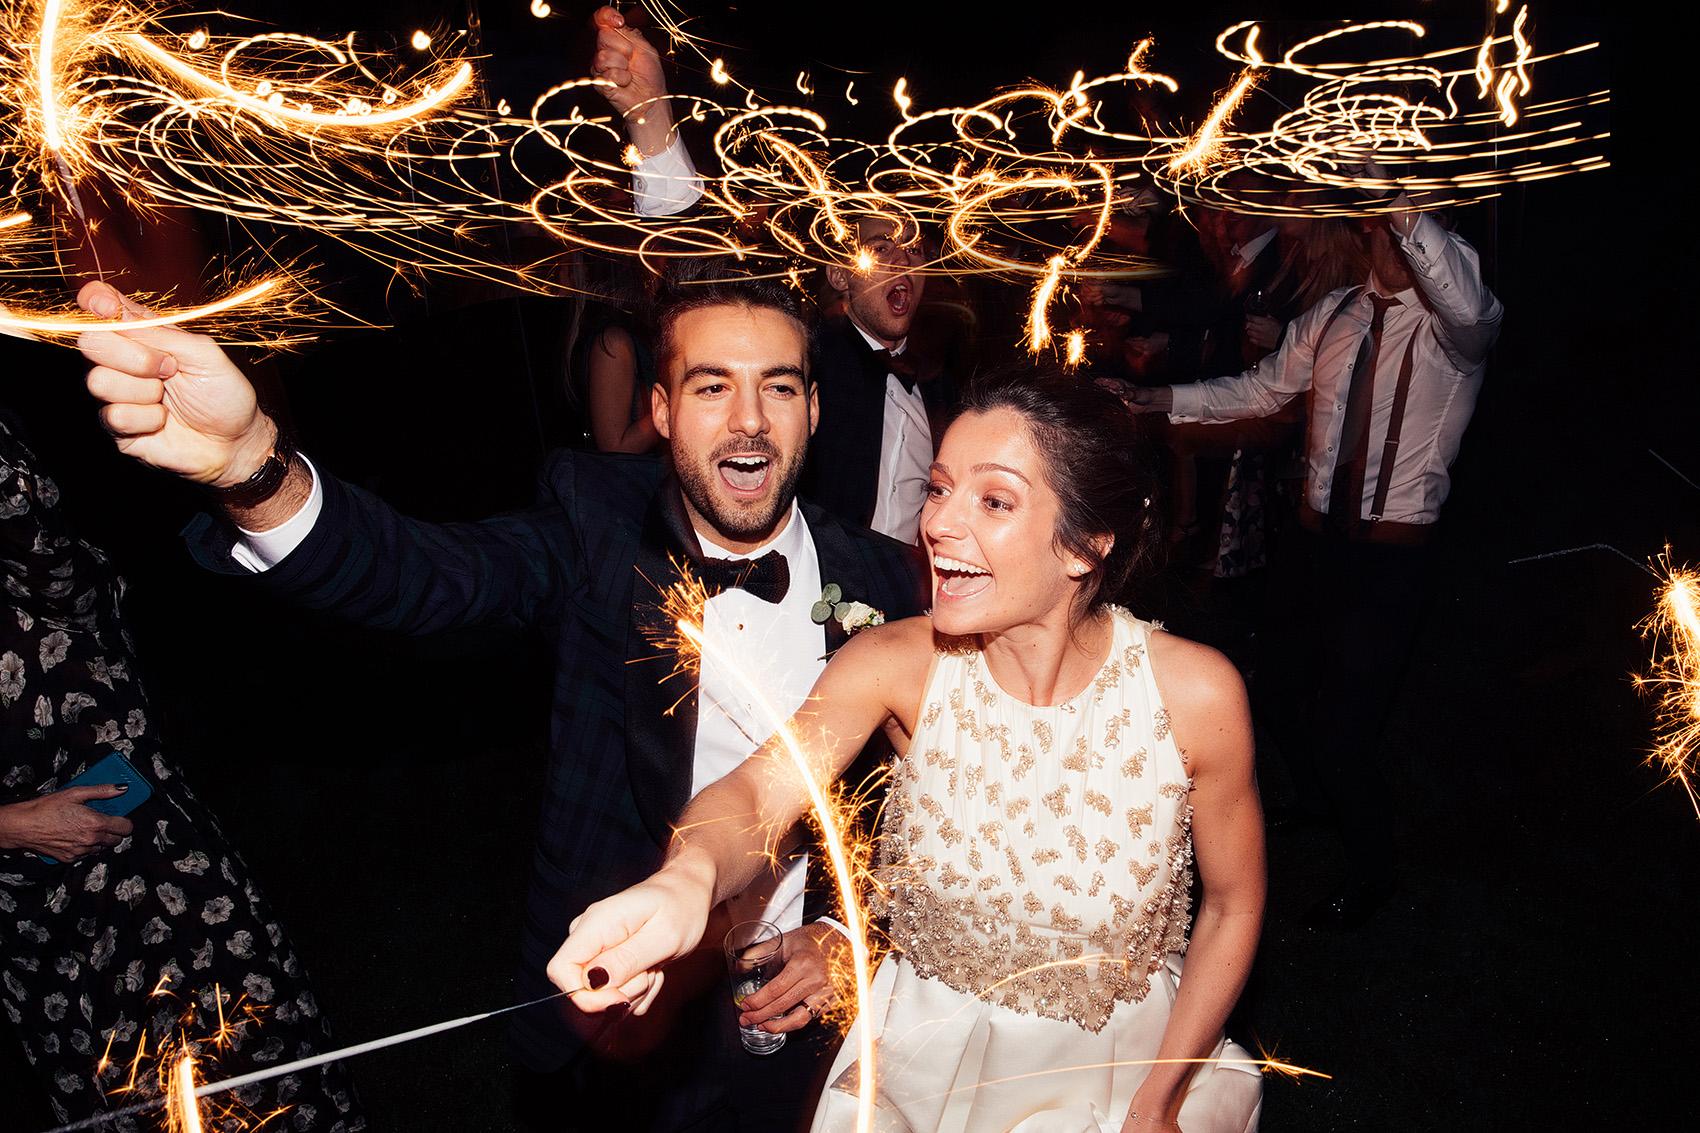 elmore-court-wedding-photography-79.jpg